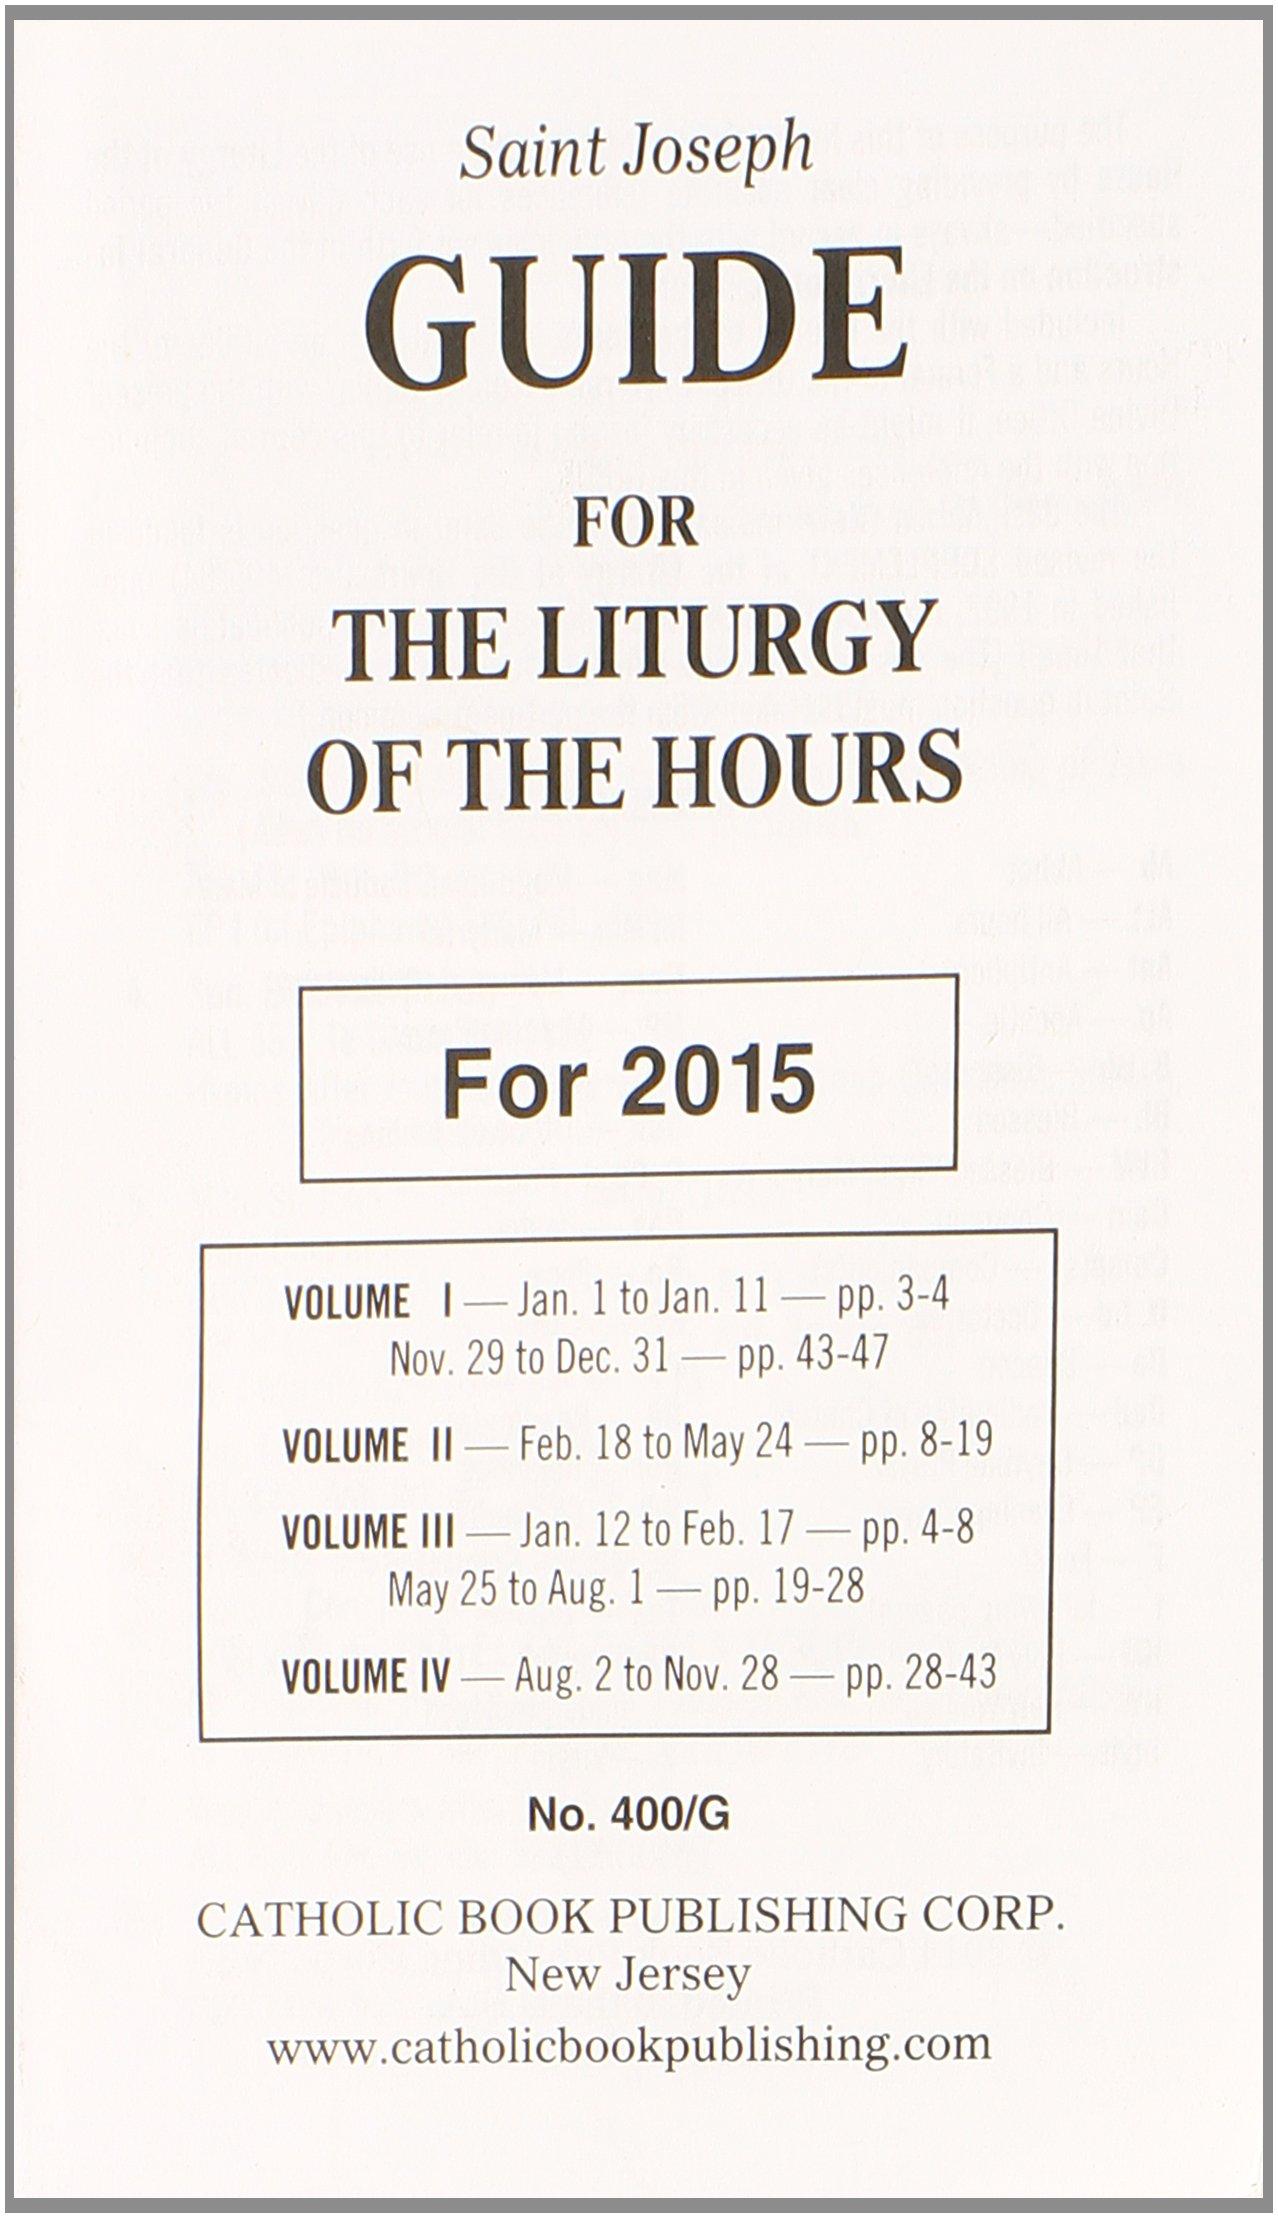 saint joseph guide for the liturgy of the hours catholic book rh amazon ca The Liturgy of Hours Calendar Priest Praying the Liturgy of Hours